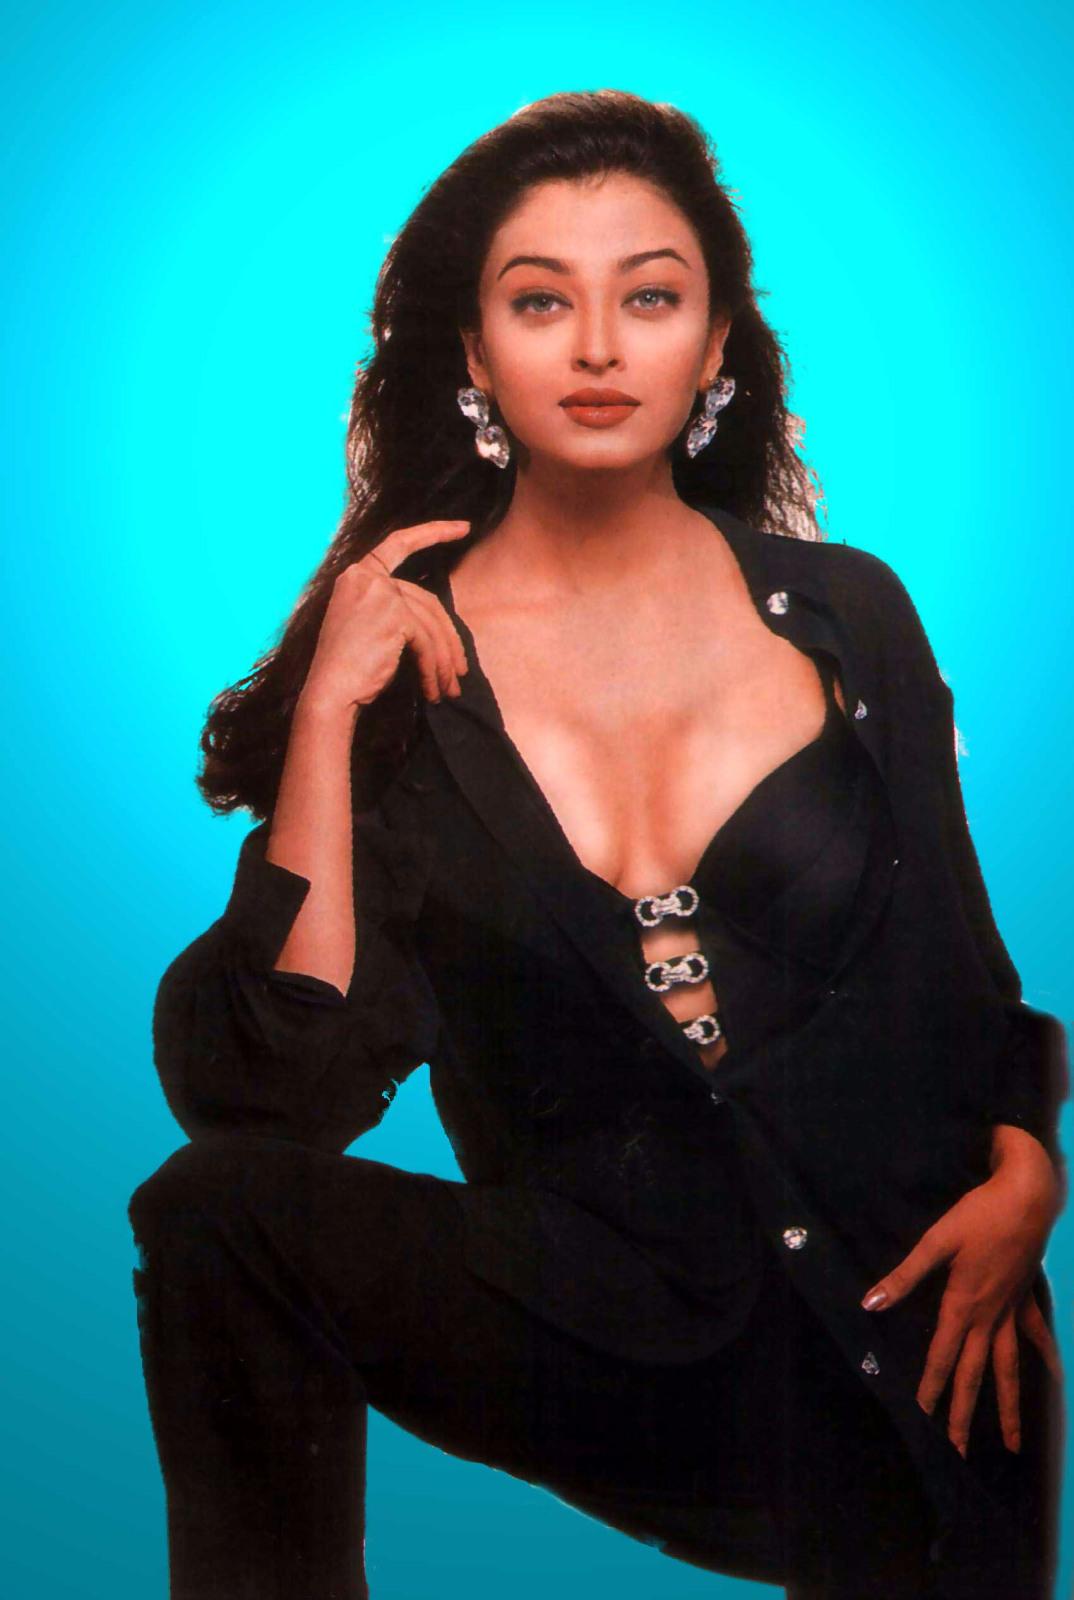 aishwarya hot picture